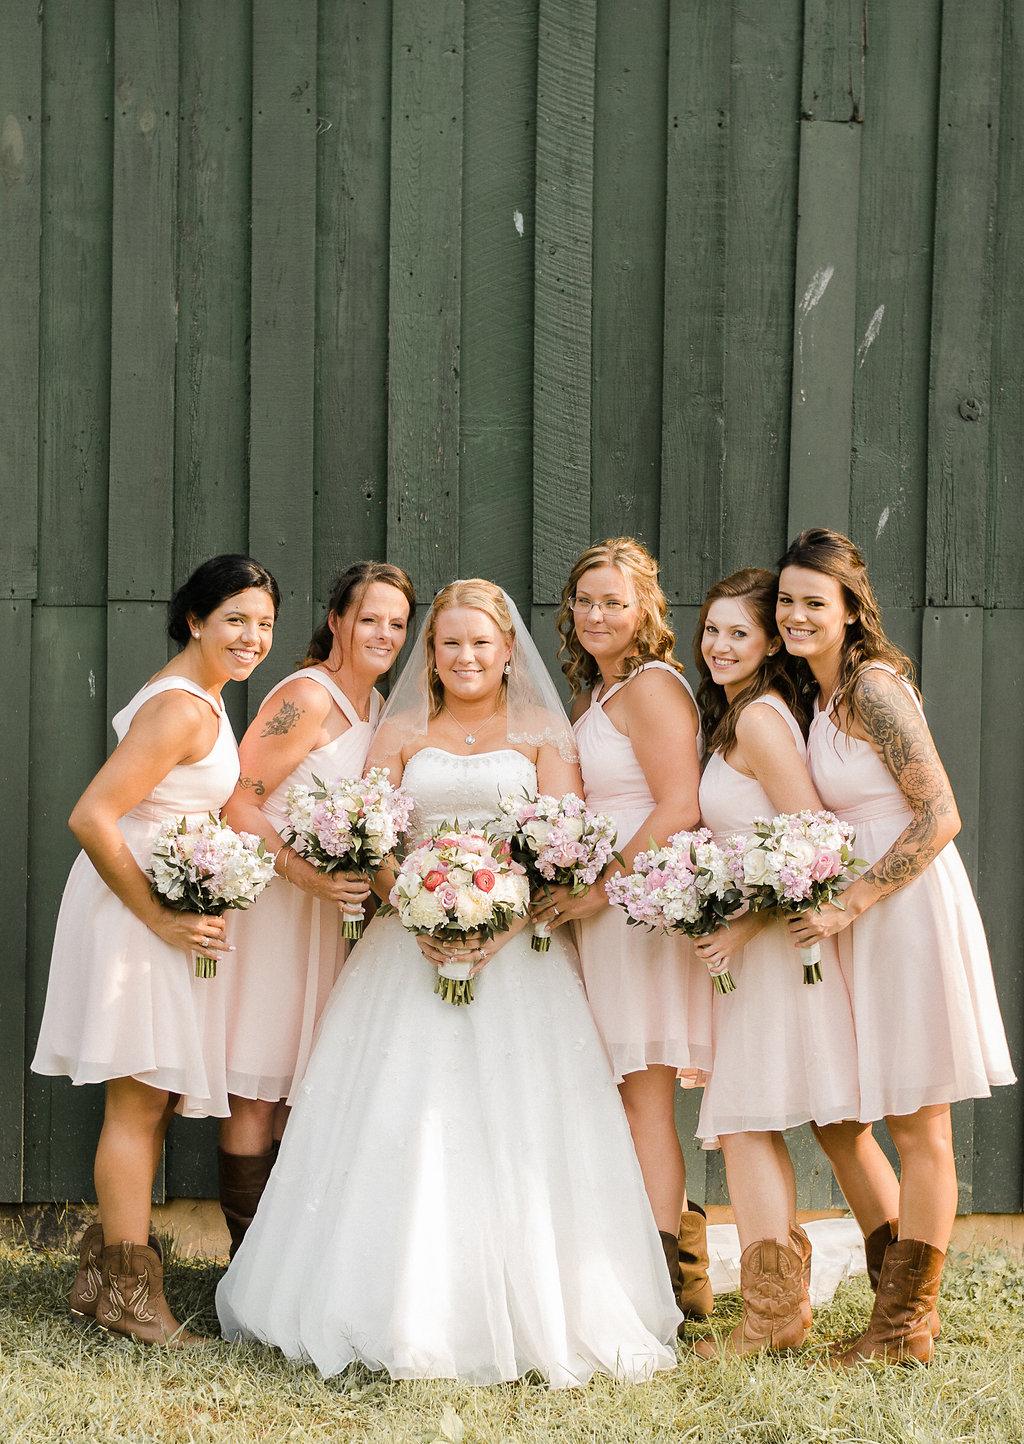 country rustic bride and bridesmaids wedding photo